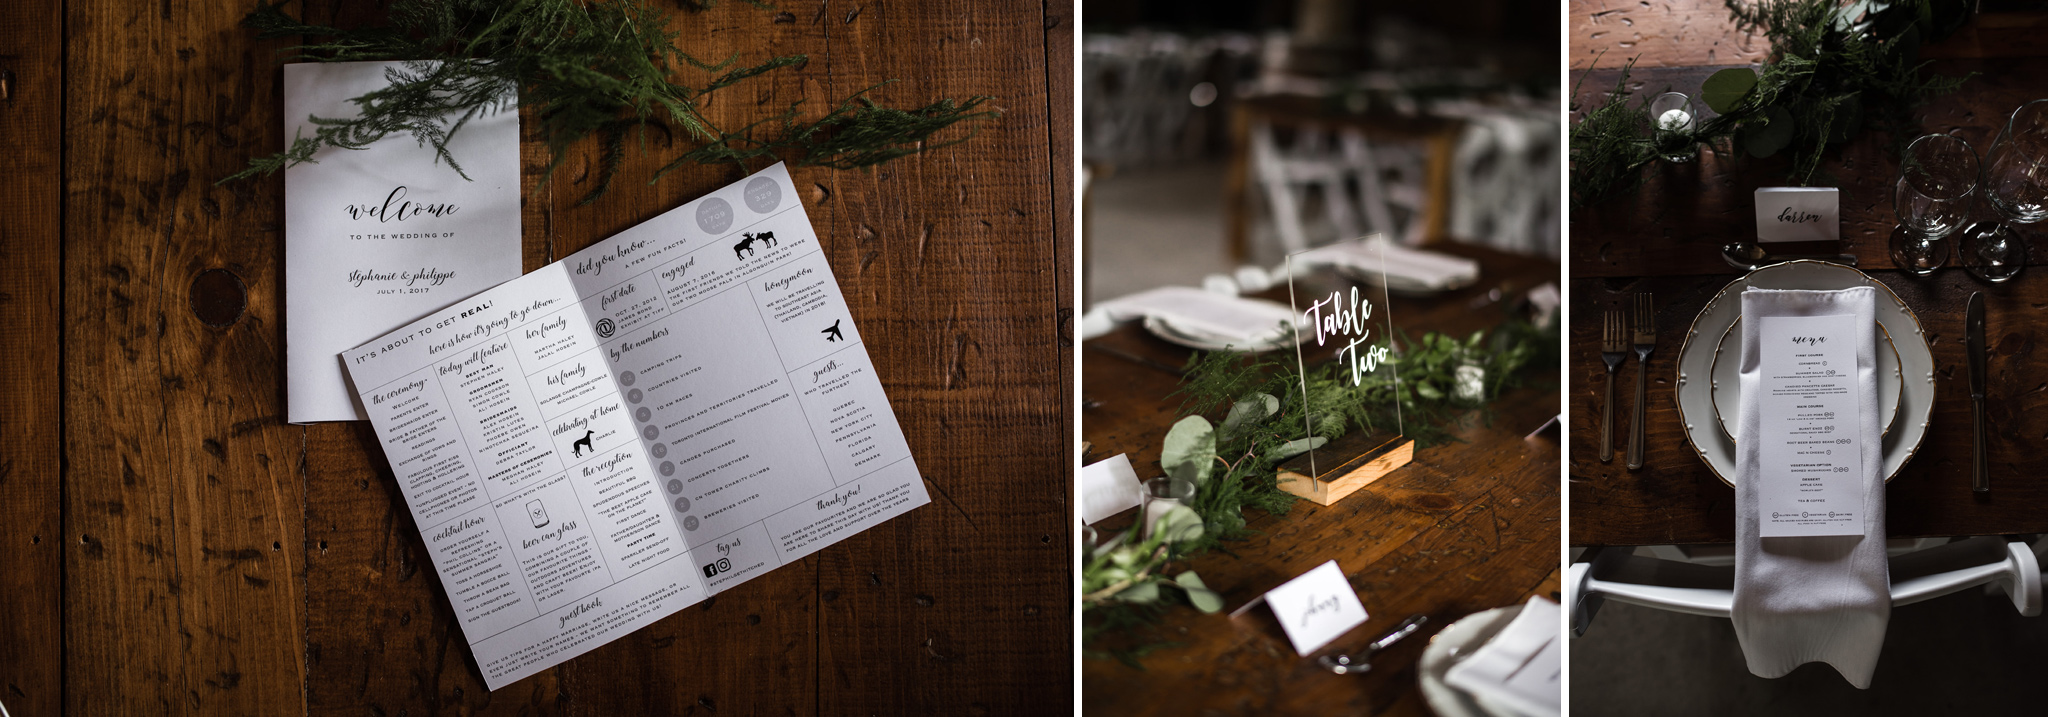 139-wedding-decor-minimalistic-greenery-trendy-toronto-photographer.jpg